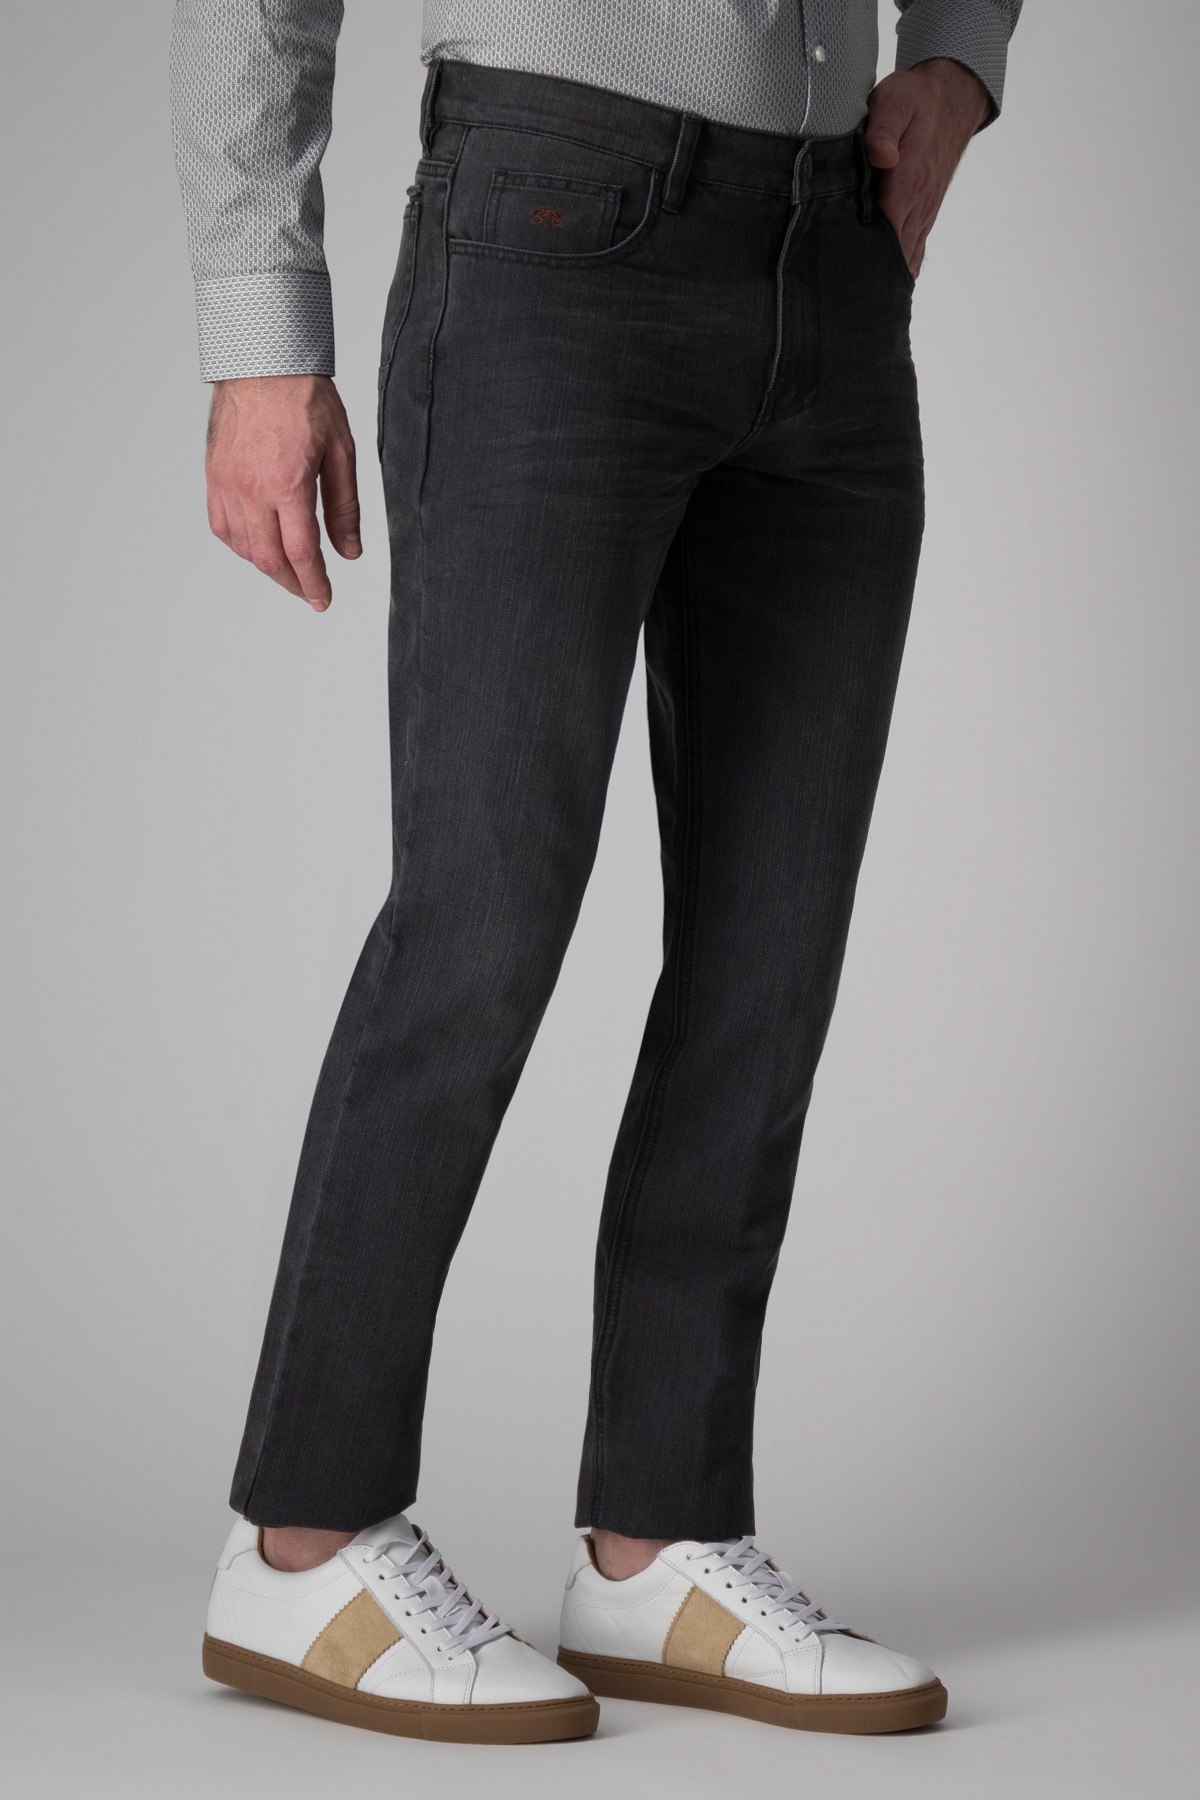 Pantalón Calderoni, modelo 5 bolsillos mezclilla color gris.